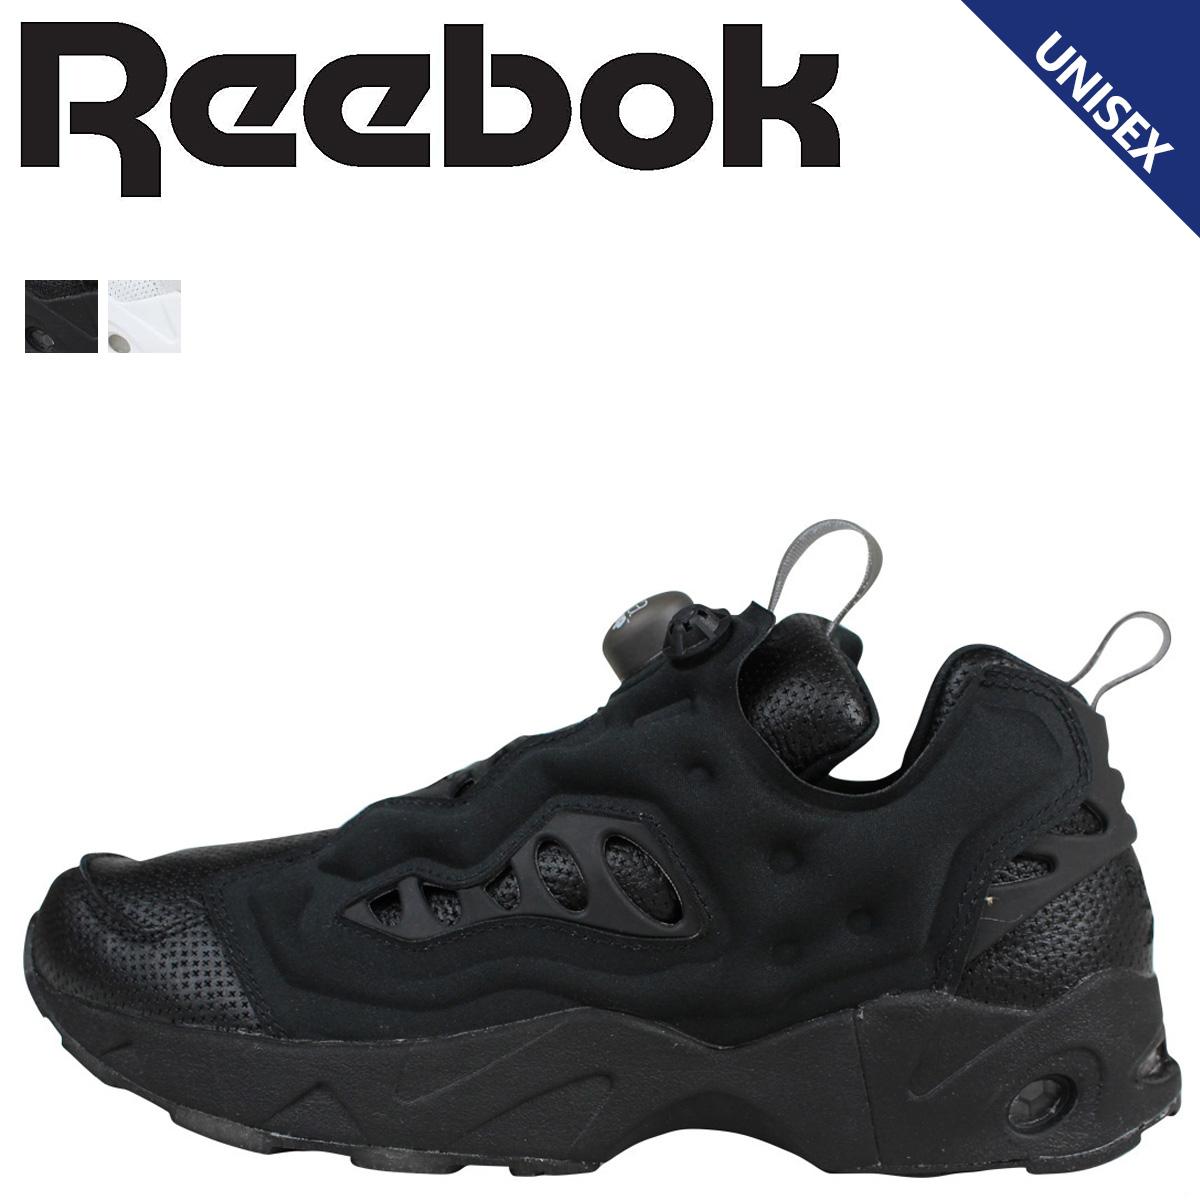 Reebok リーボック ポンプフューリー スニーカー INSTAPUMP FURY ROAD PL AQ9977 AQ9978 メンズ レディース 靴 ホワイト 白 ブラック 黒